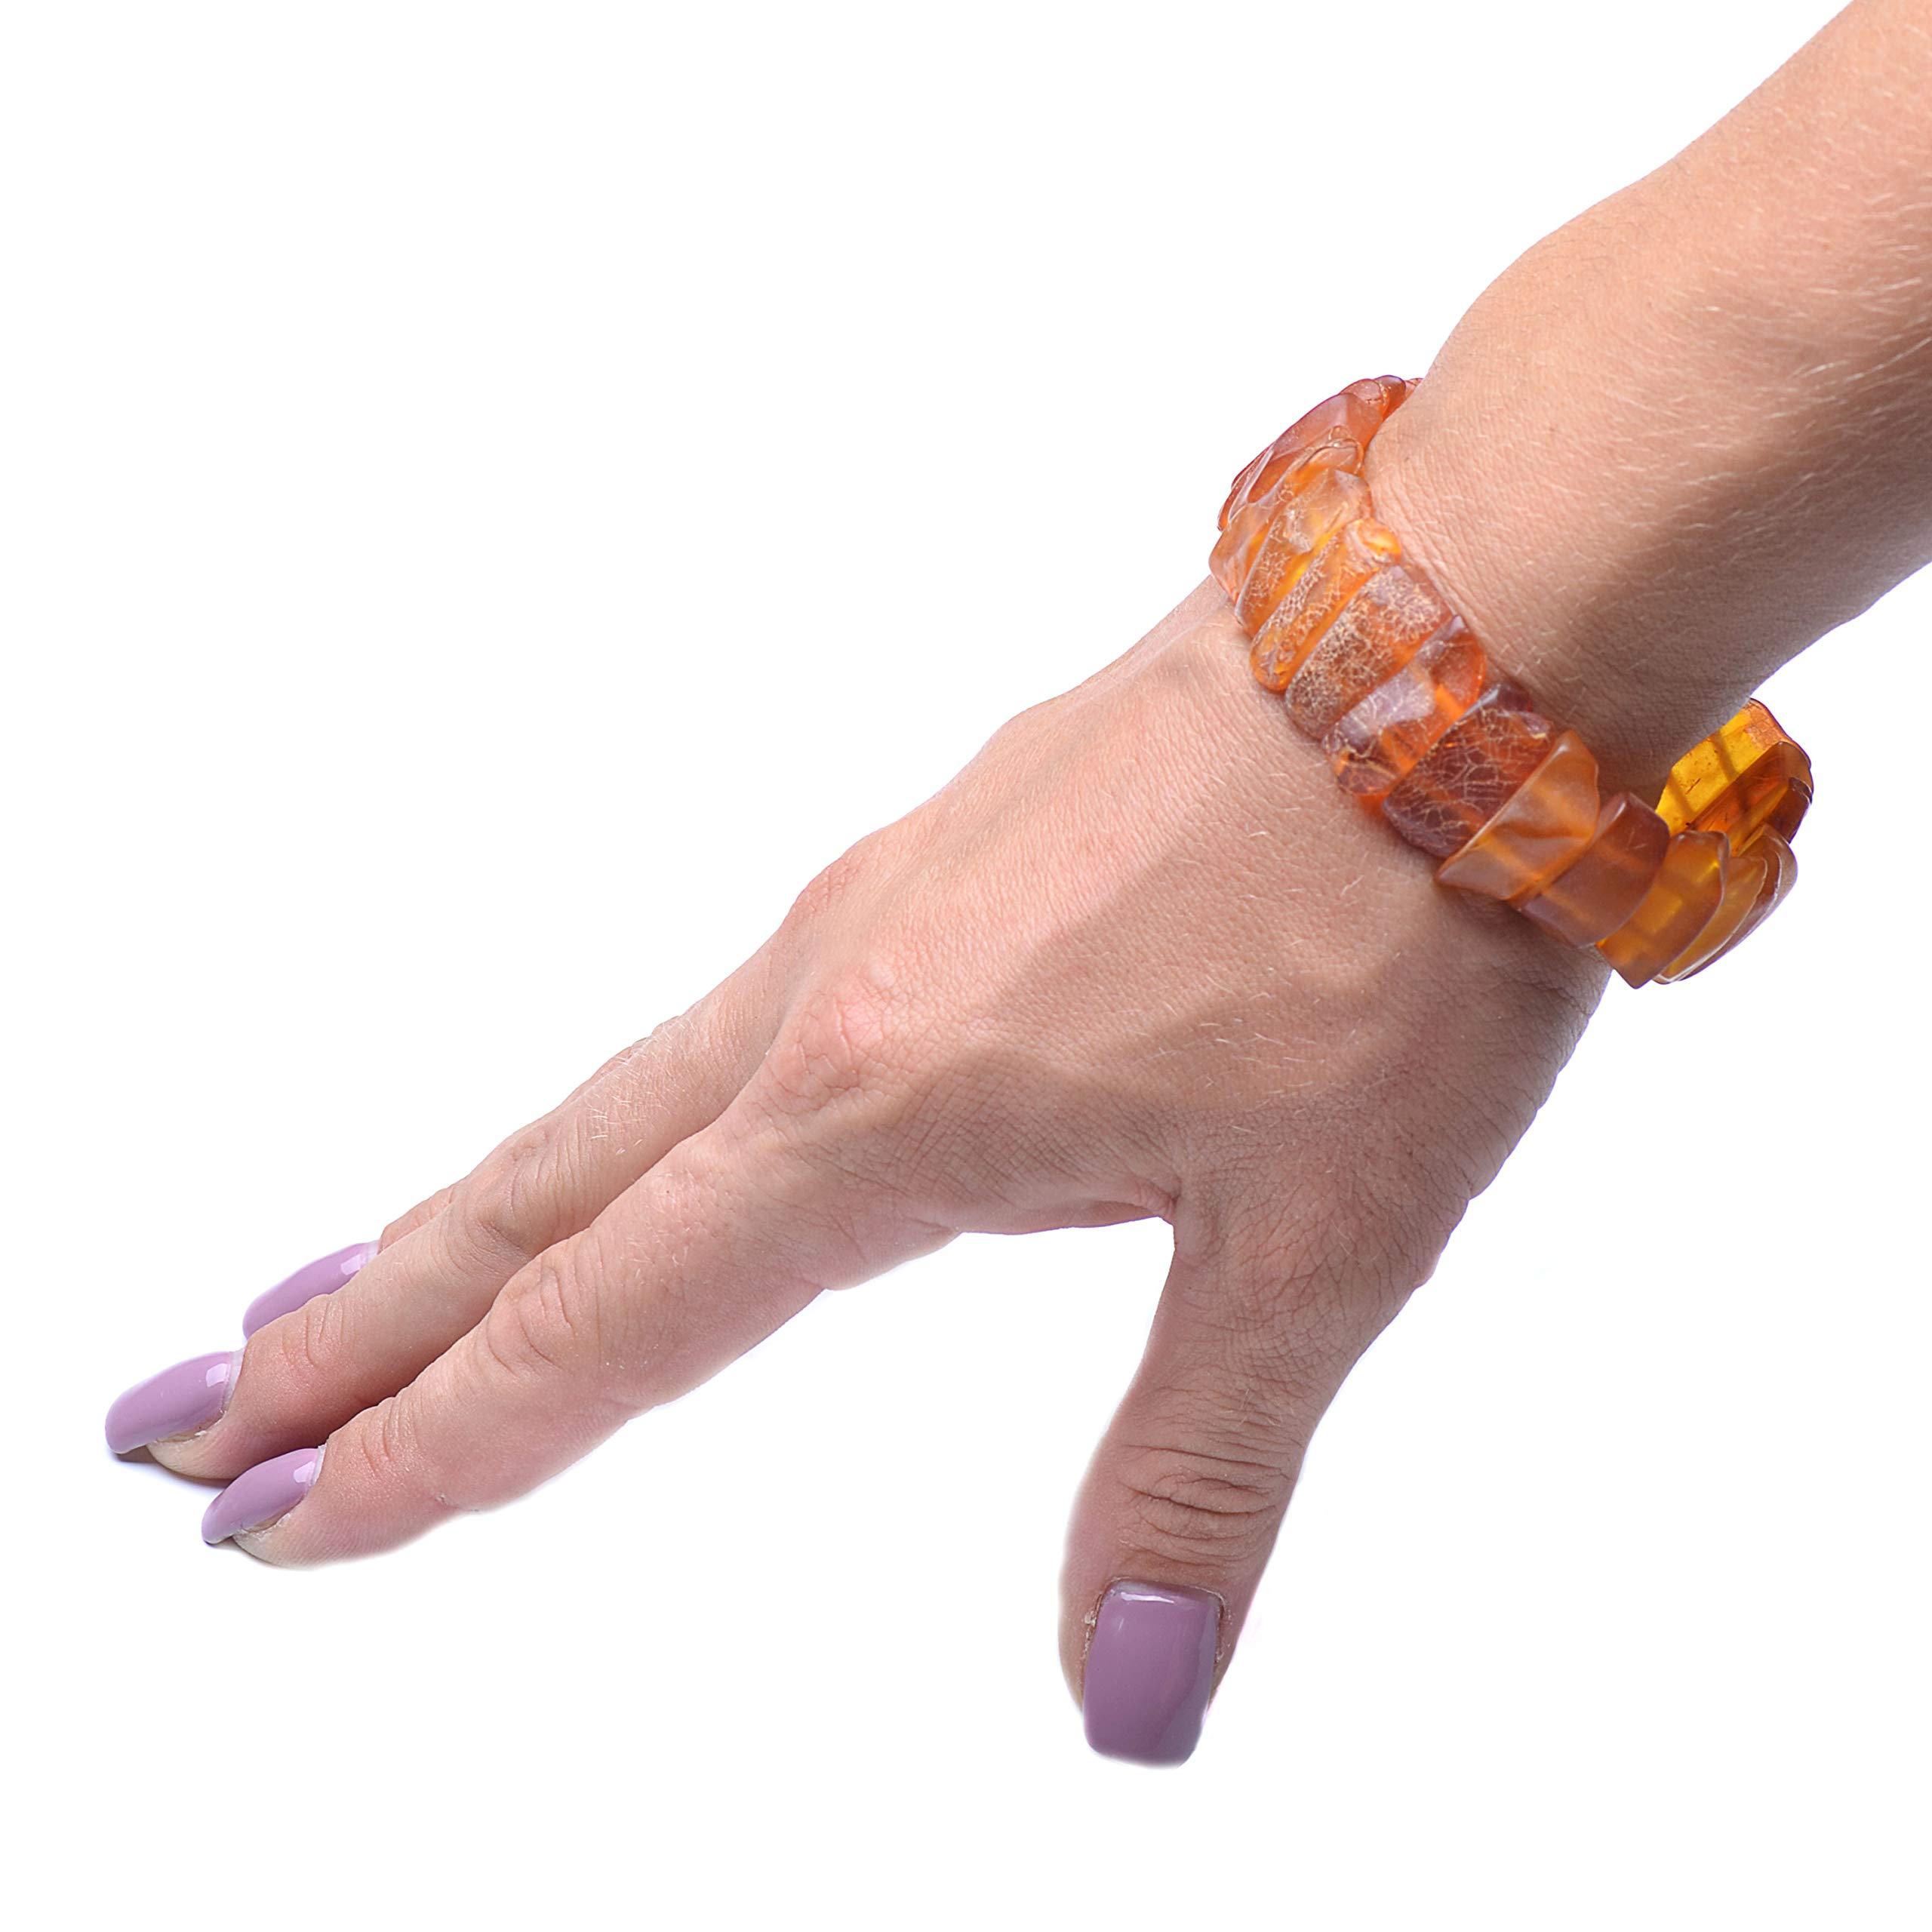 Amber Bracelet - Unique Amber Bracelet - Exclusive Amber Bracelet - Vintage Bracelet - Genuine Baltic Amber by Genuine Amber (Image #5)